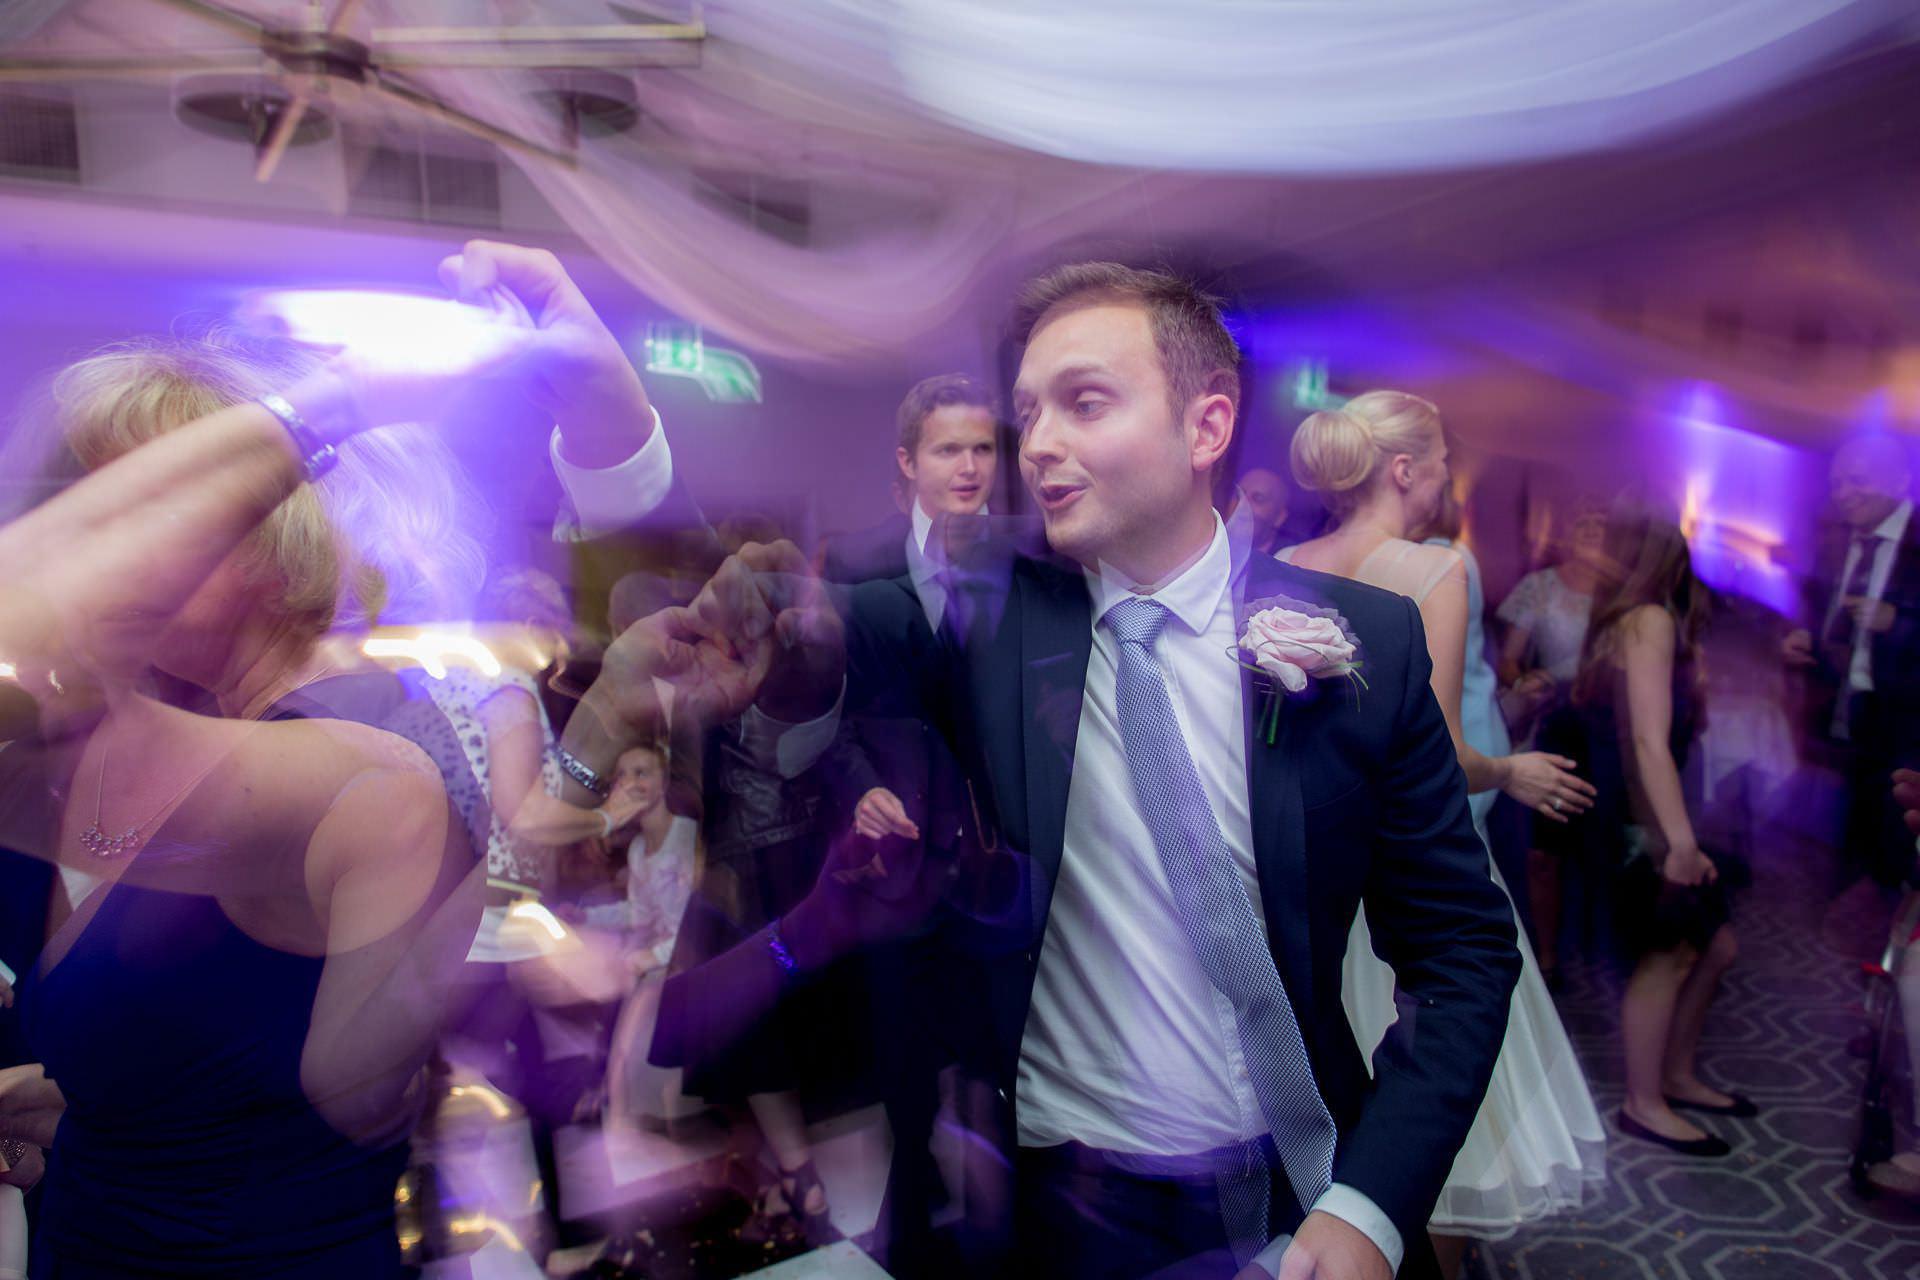 Wotton House wedding brother of the groom dancing